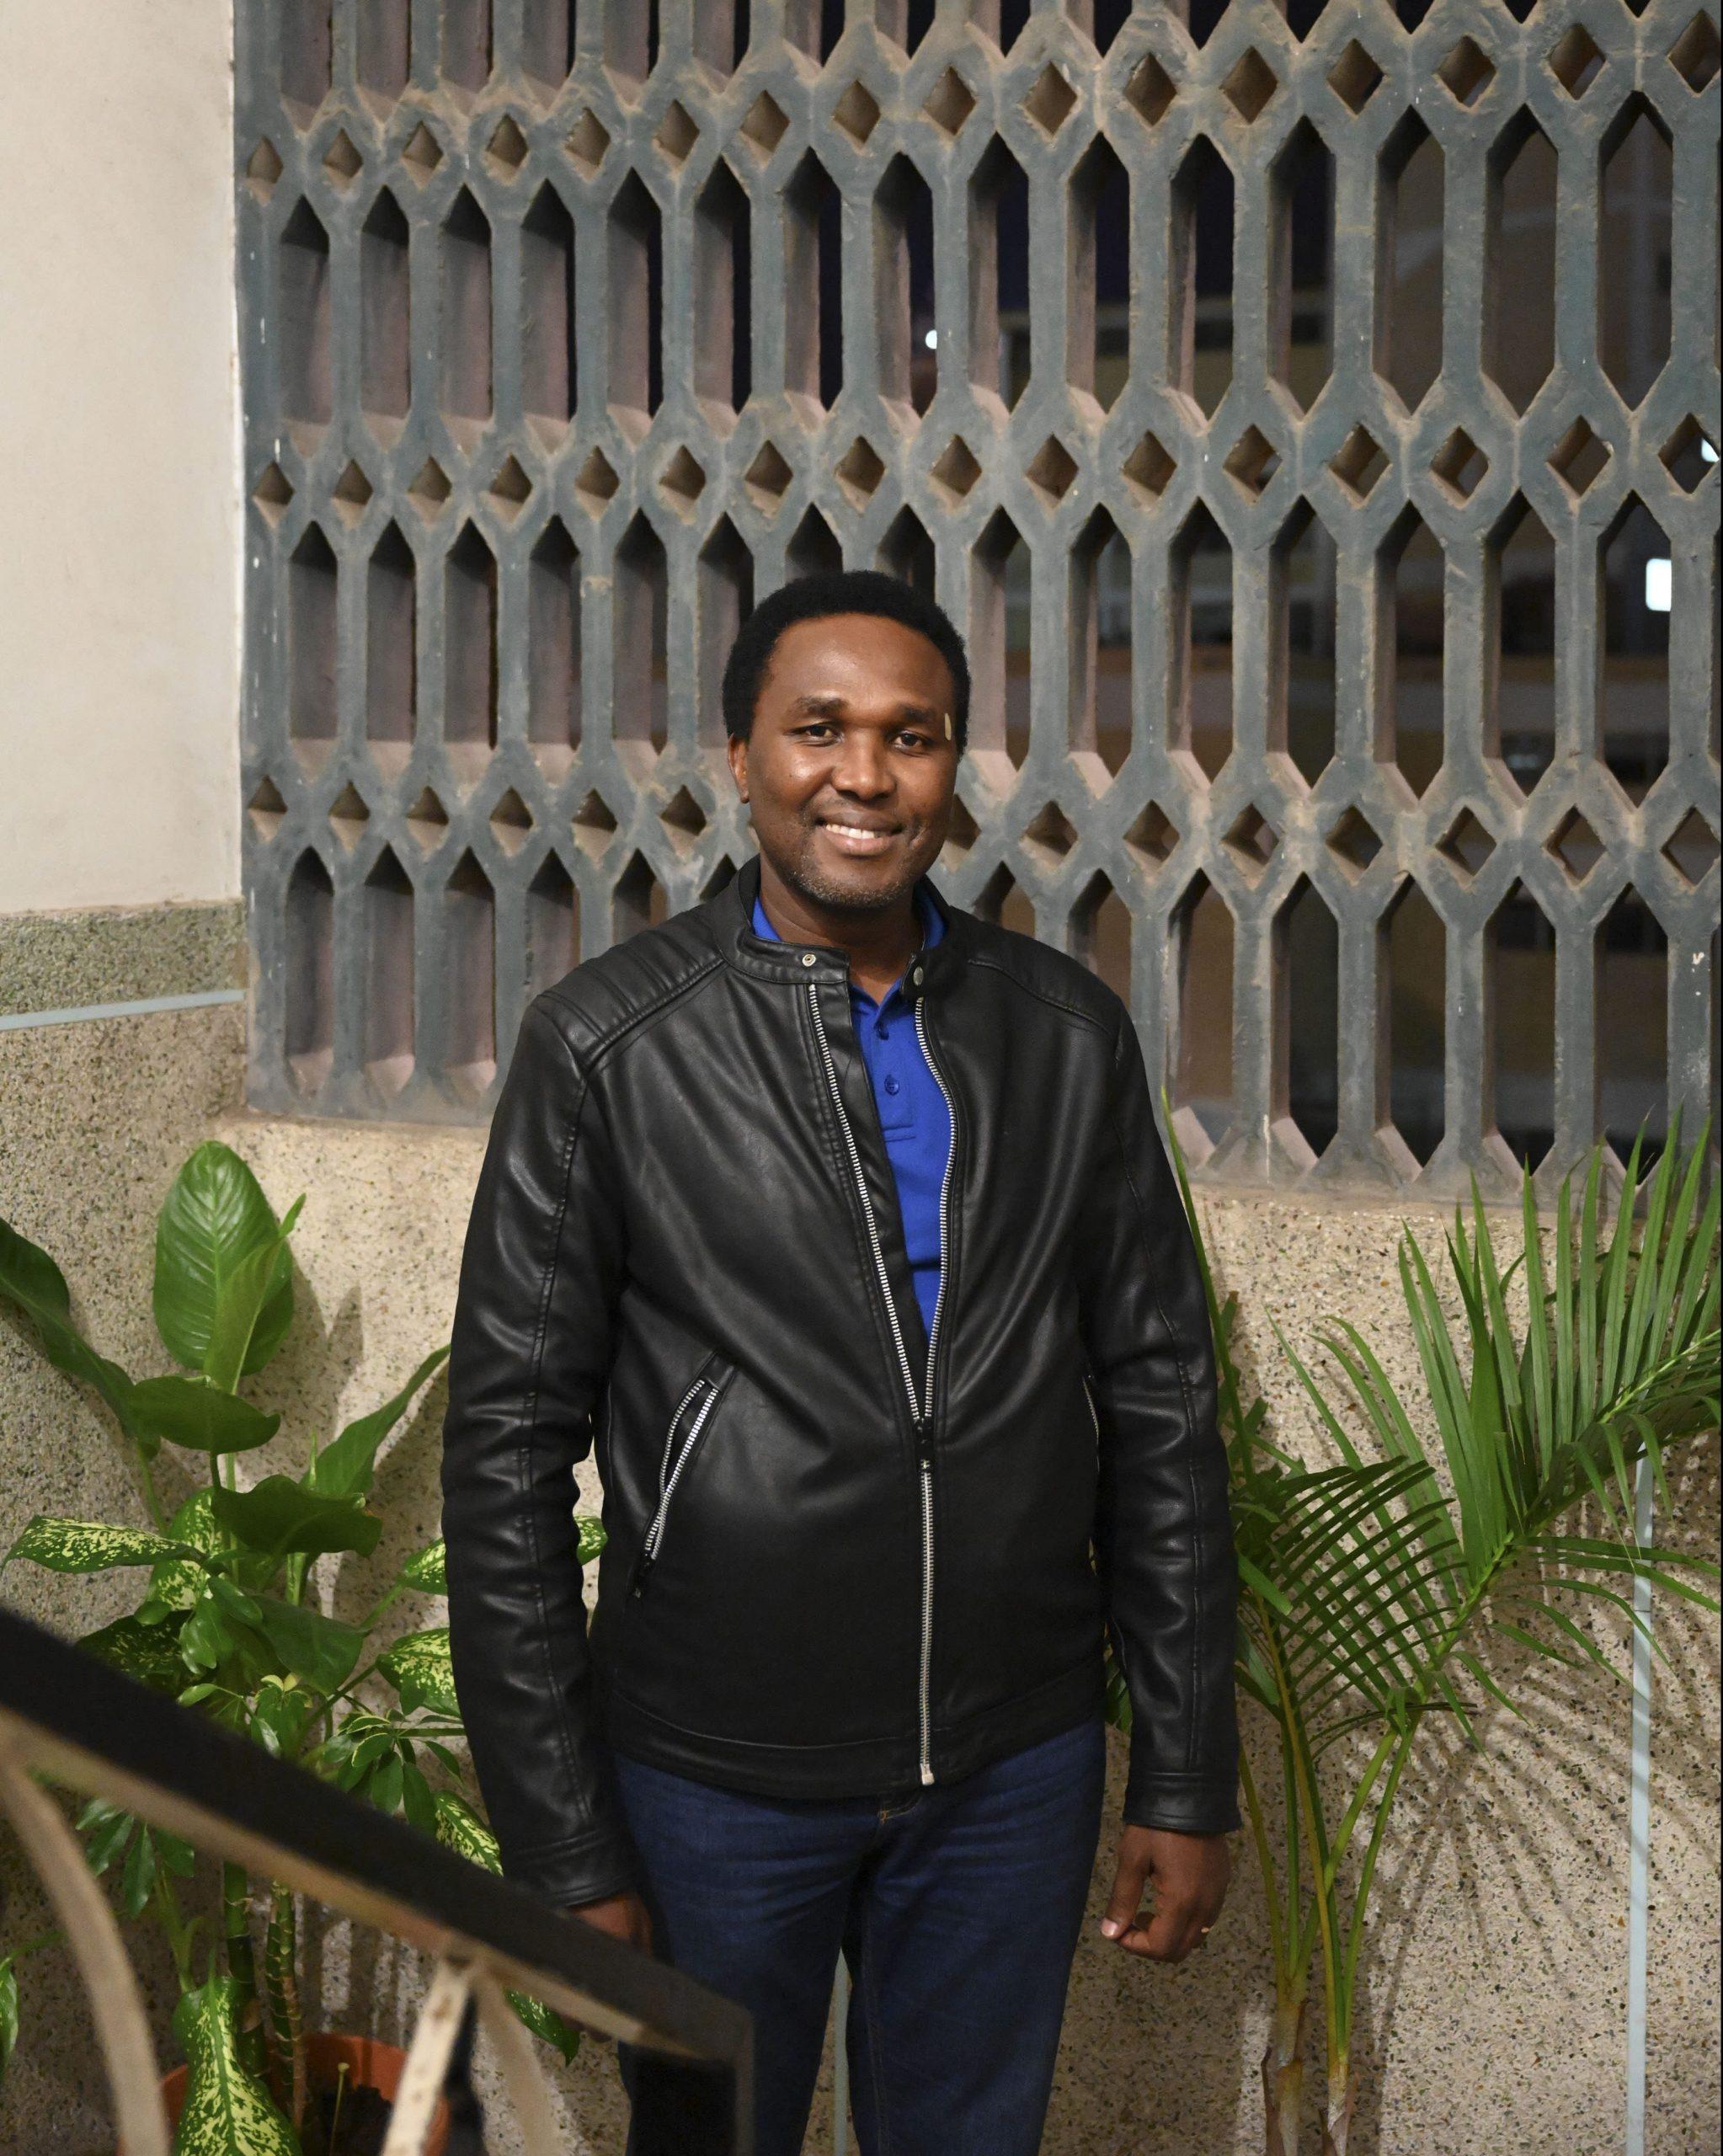 Moçambique Politik Krise Journalismus Schweiz